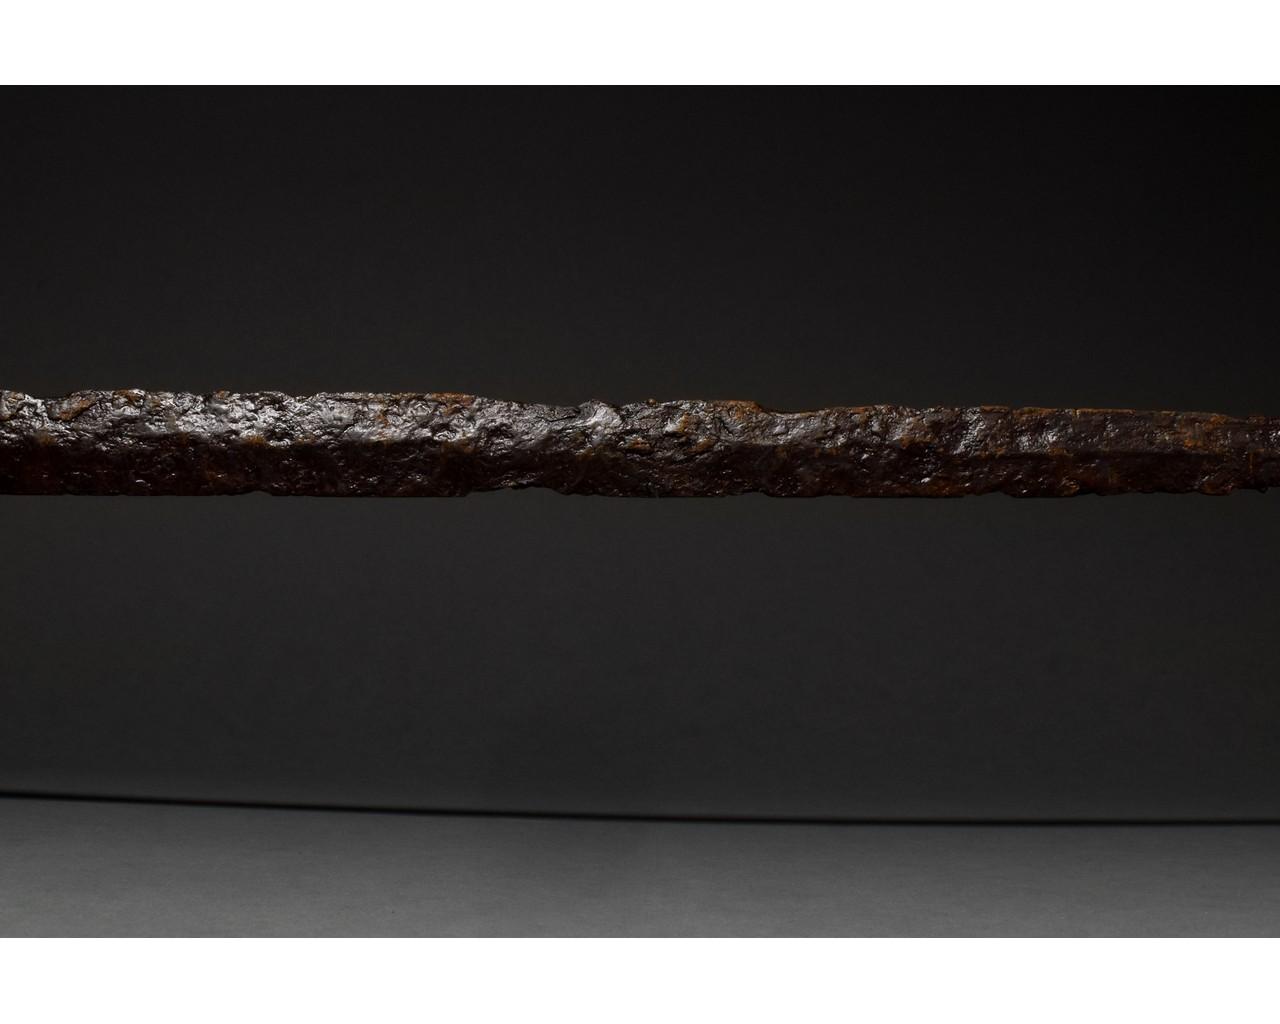 ROMAN IRON SPATHA SWORD - Image 6 of 8